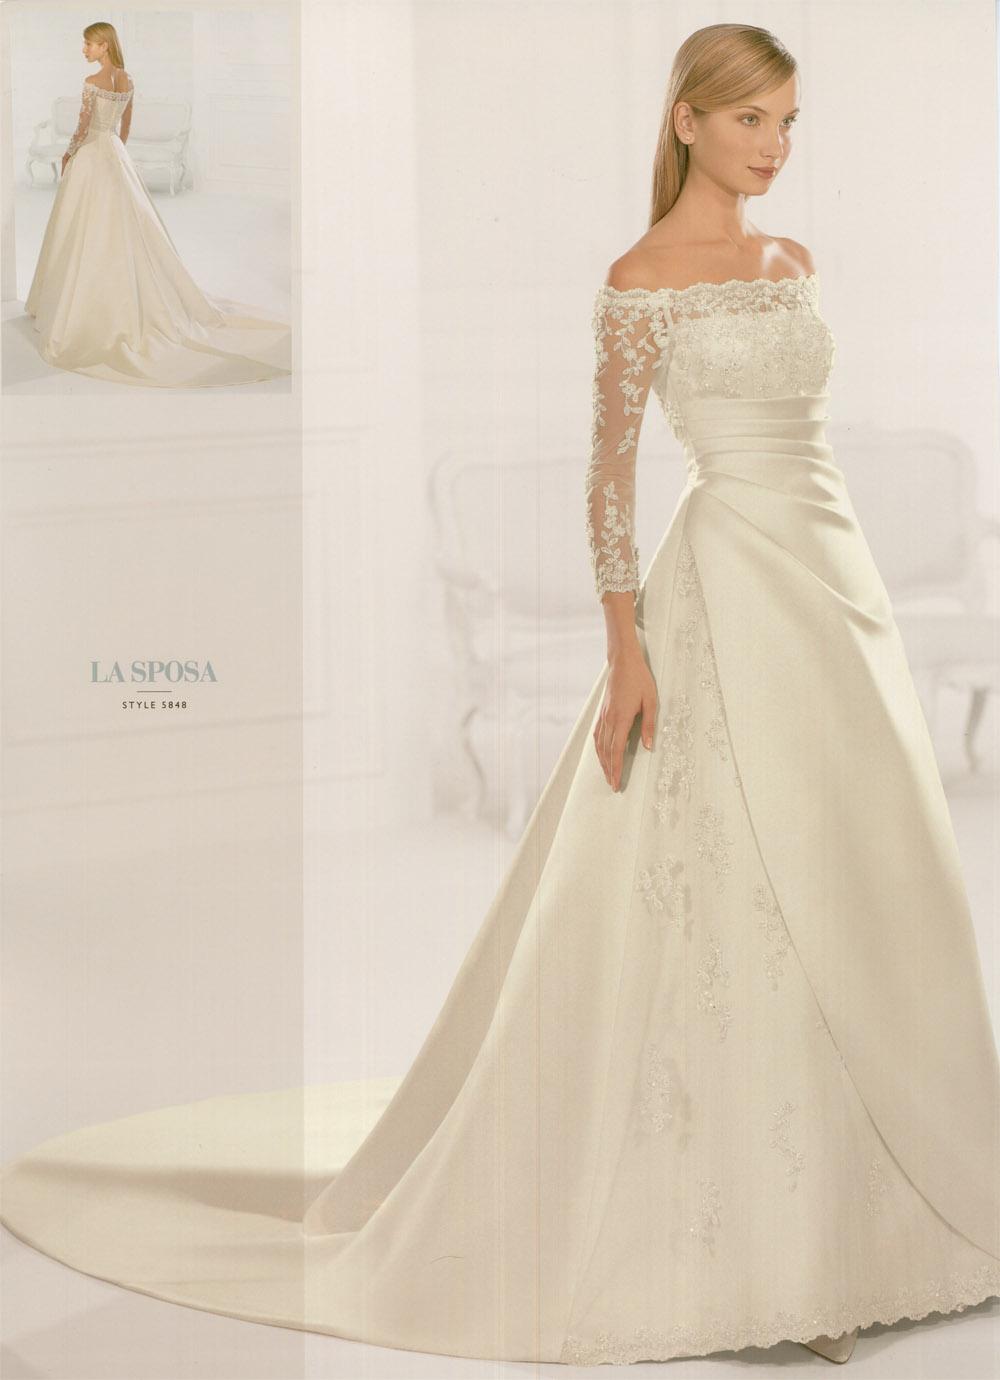 lace wedding dresses with sleeves ireland wedding dresses with sleeves Al Wedding Dresses With Sleeves 42